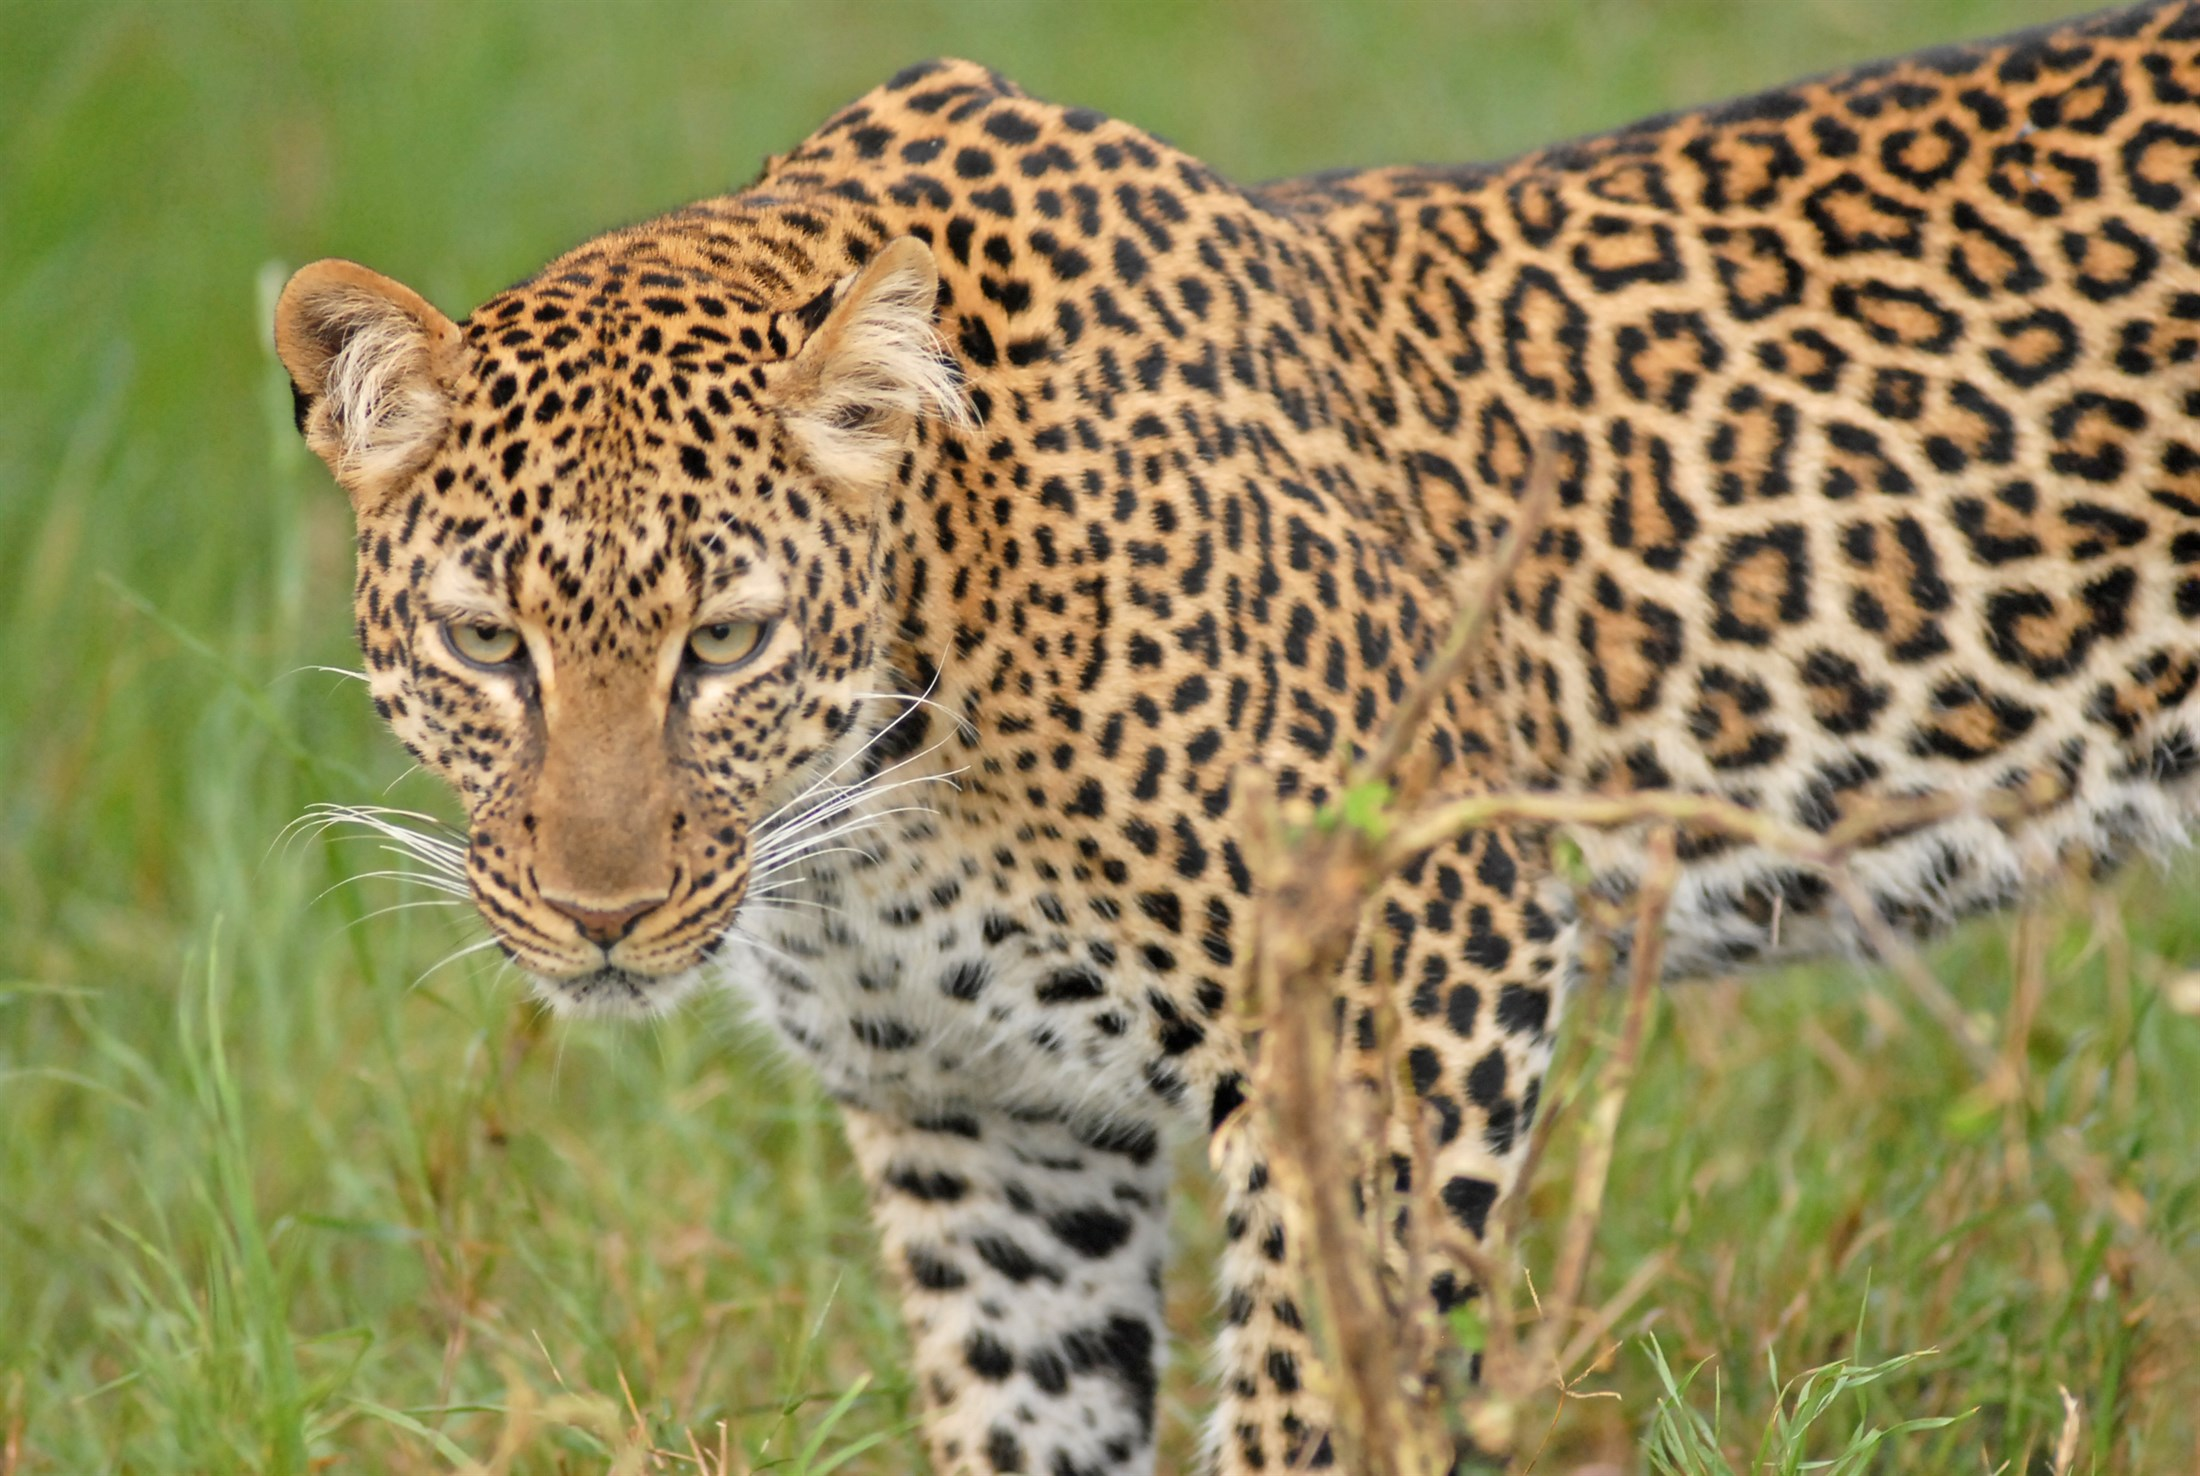 leopard-panthera-pardus-masai-mara-reserve-kenya_173e-2200x1476px